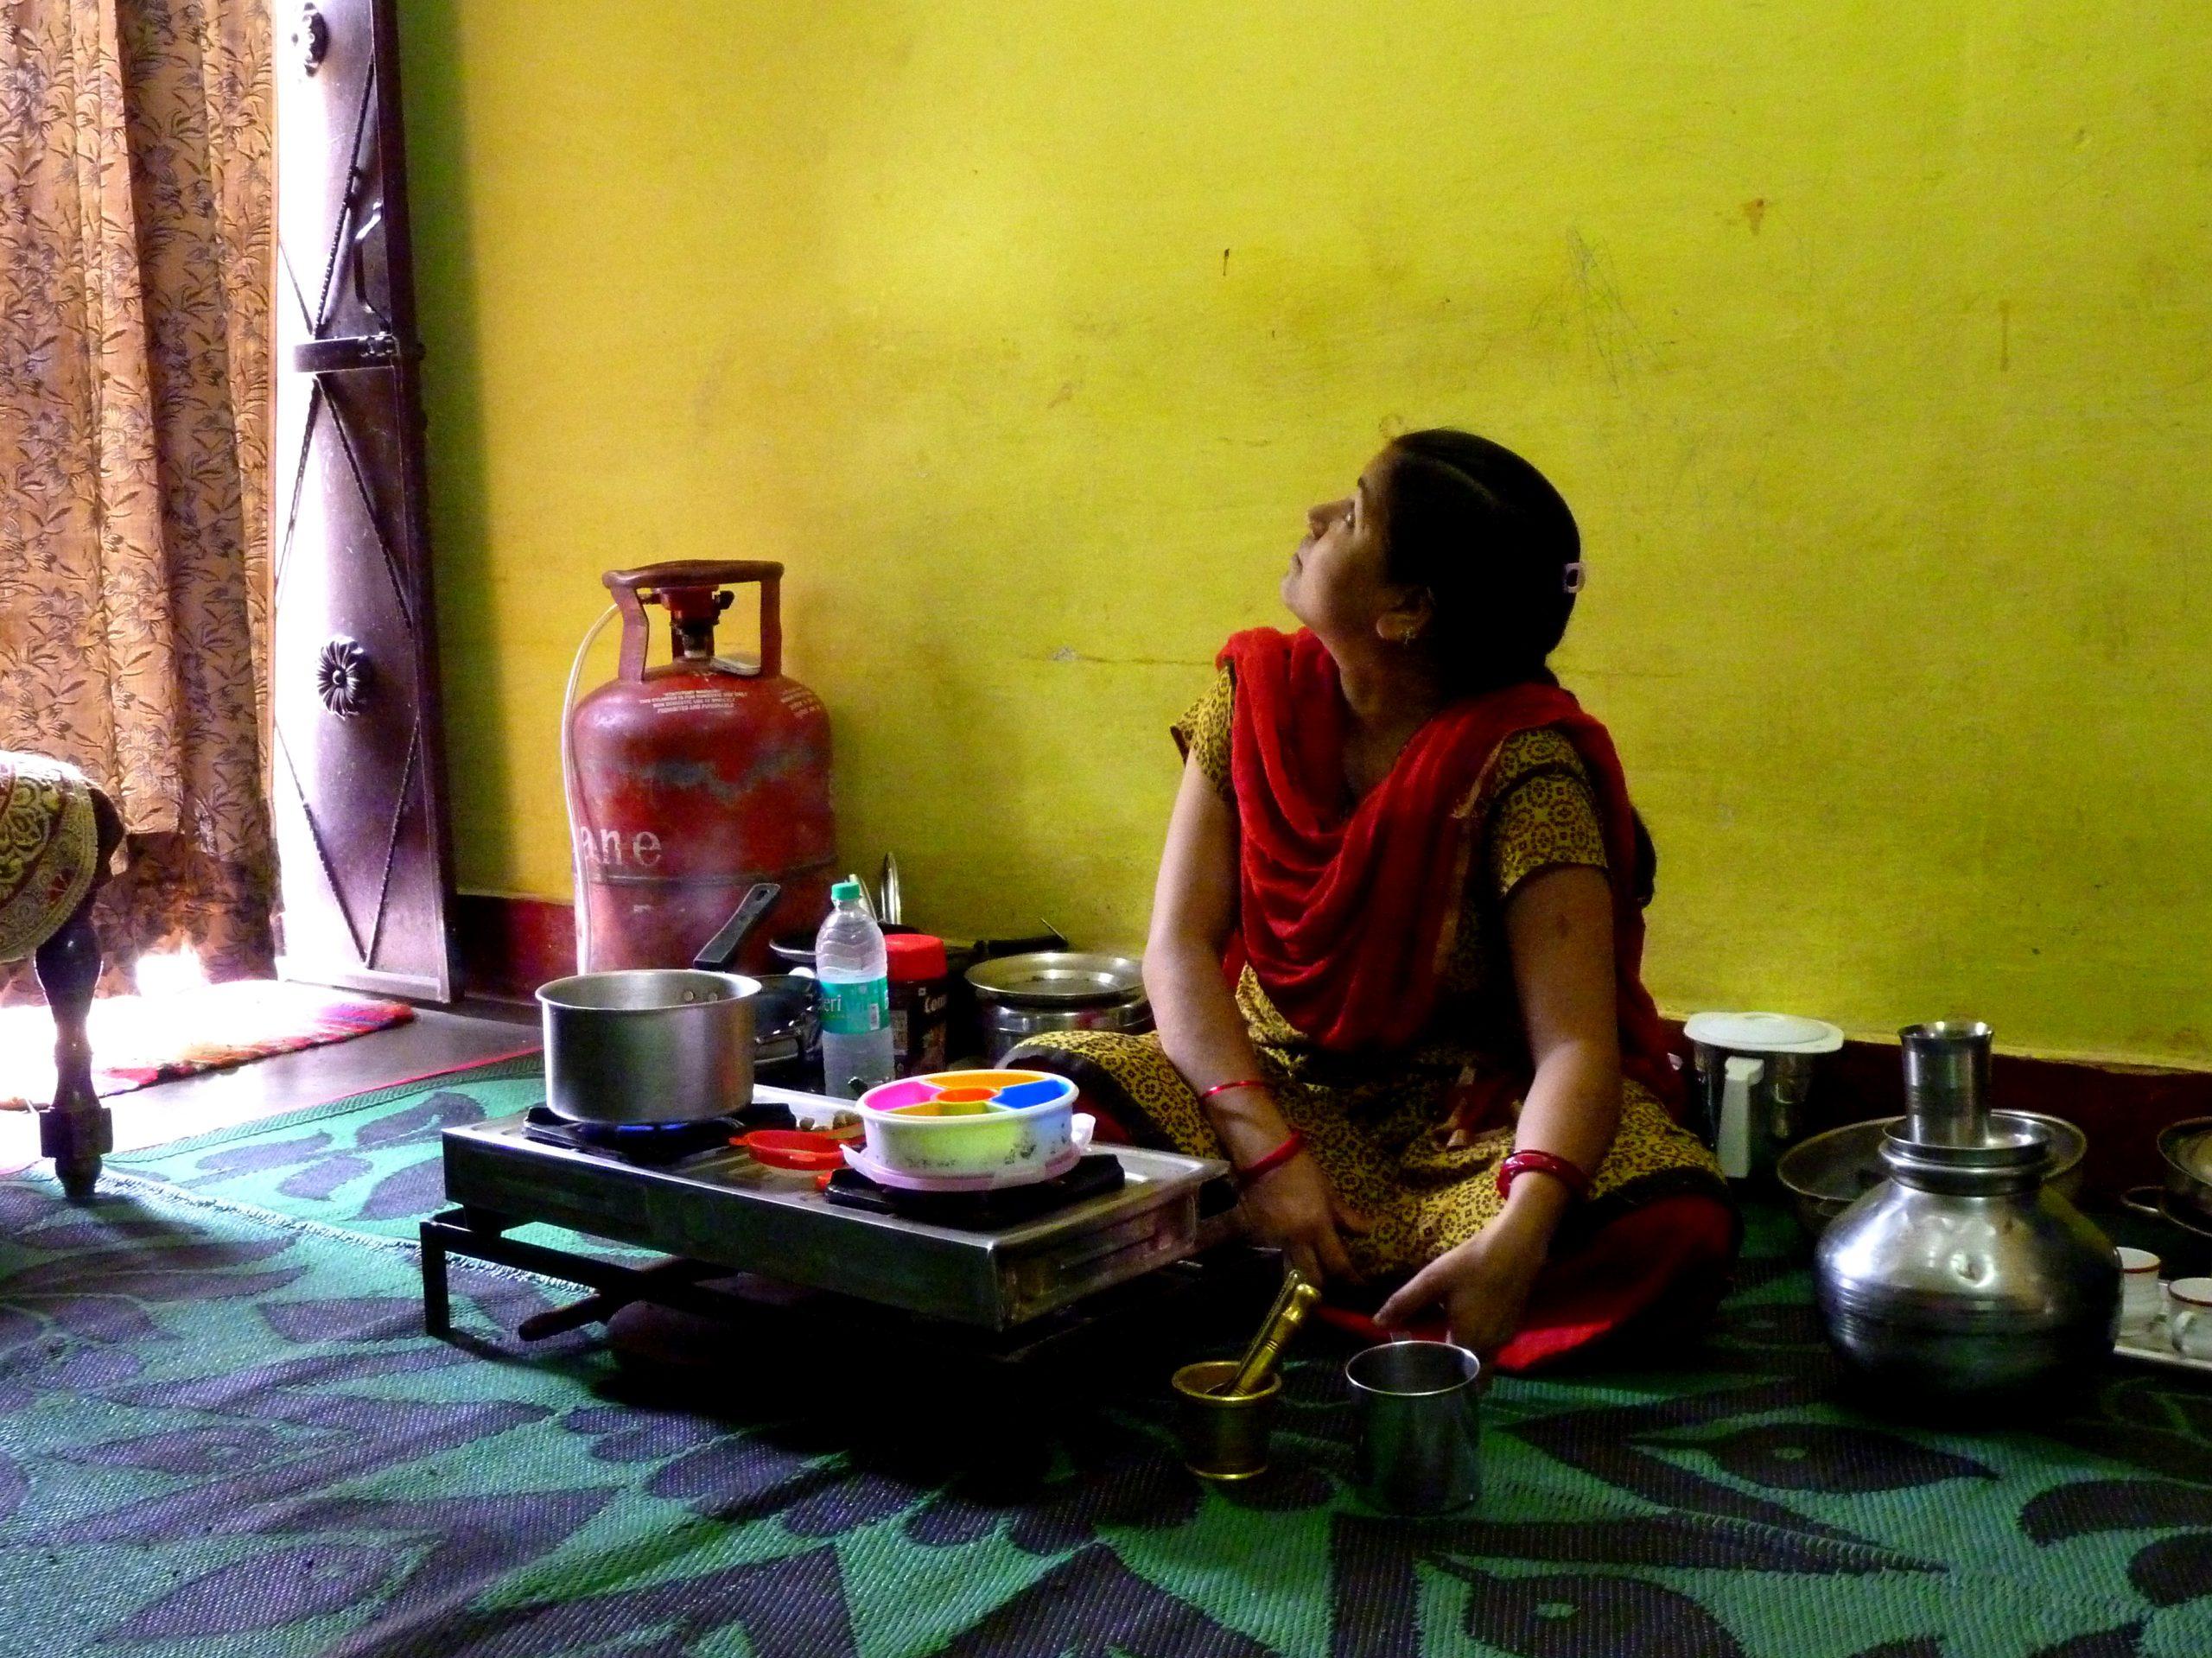 2015, Orchha, India